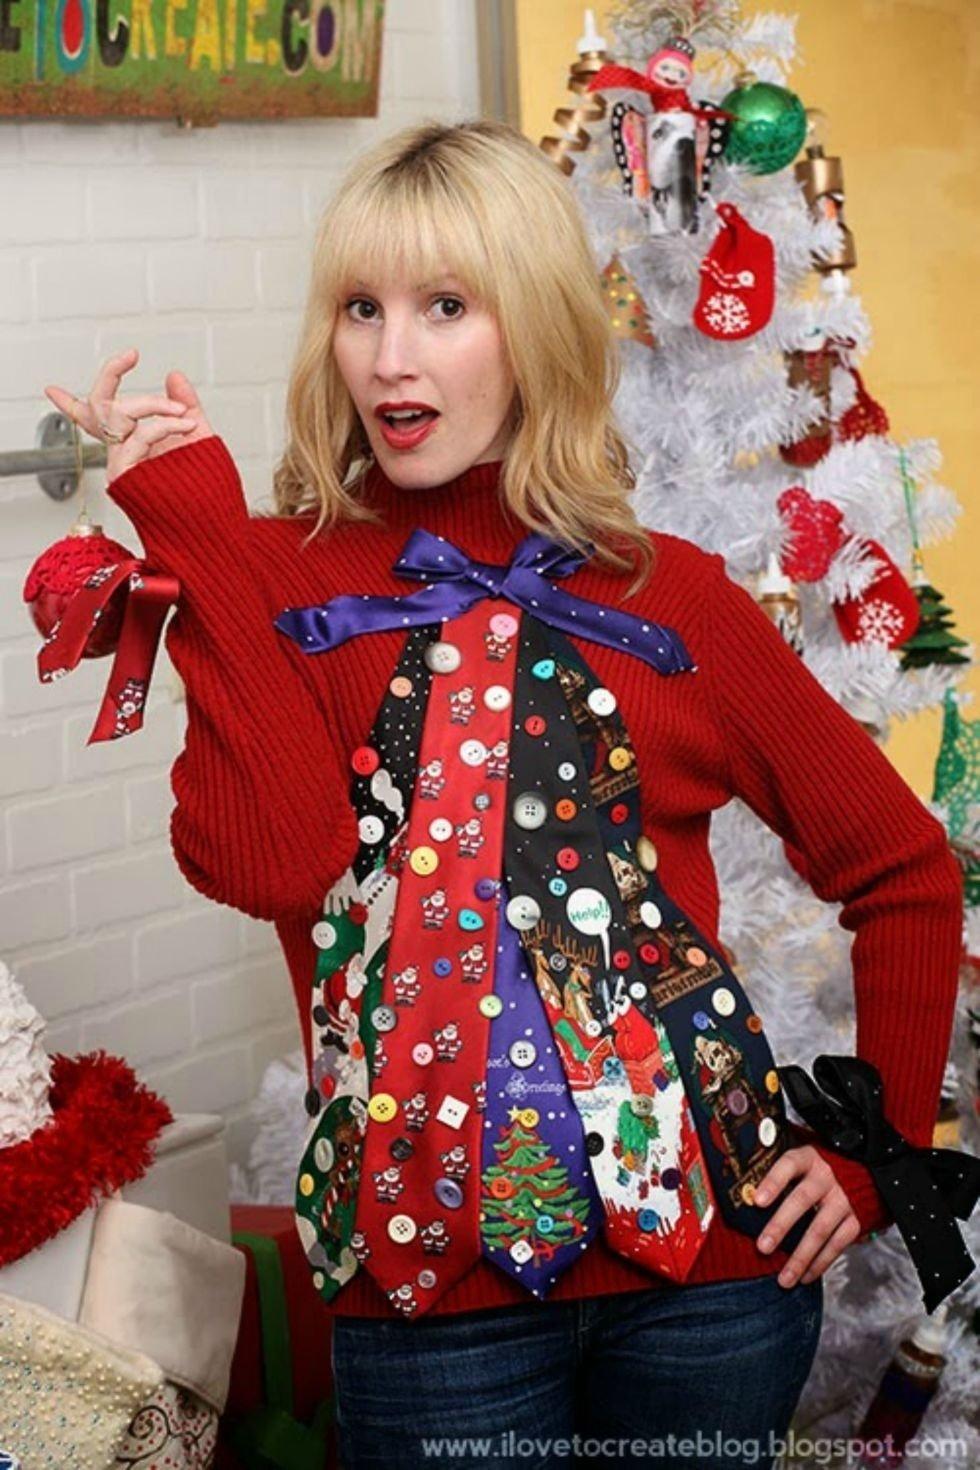 10 Stylish Ugly Christmas Sweaters Ideas Homemade 23 ugly christmas sweater ideas to buy and diy tacky christmas 3 2021